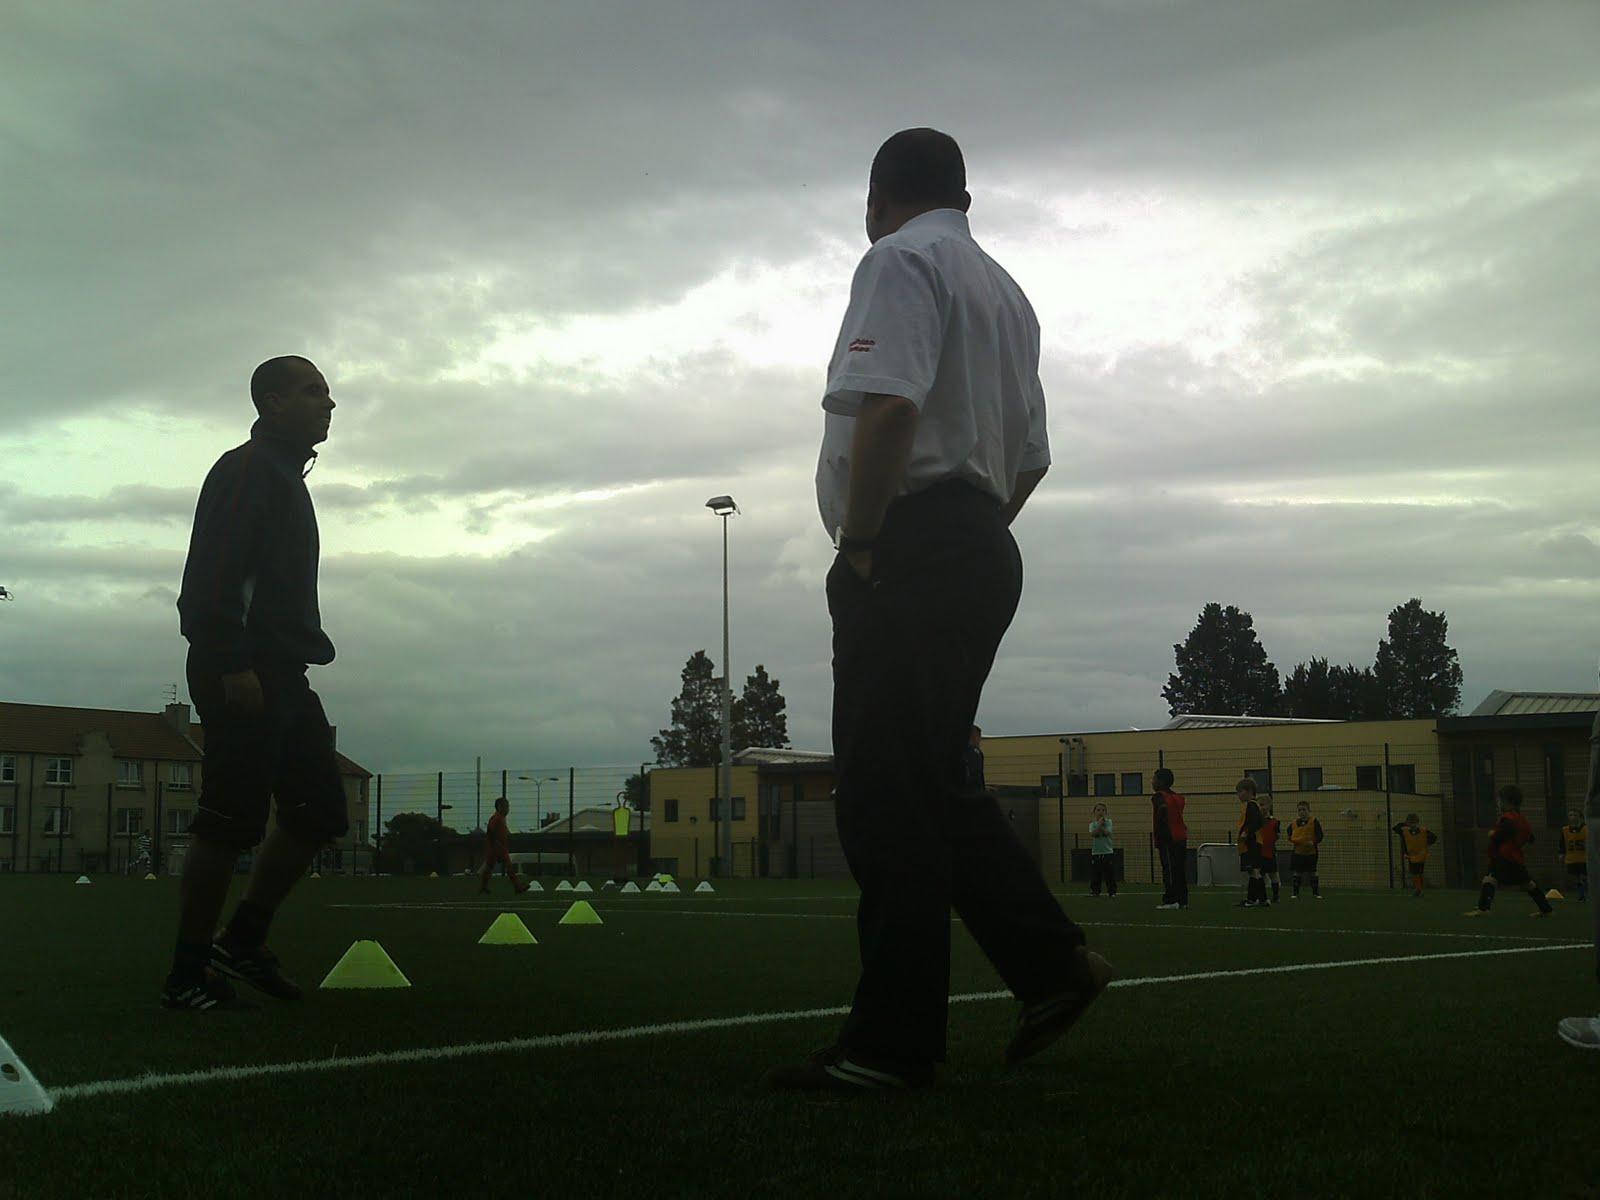 IGOR ROMARIZ: Lochend Youth FC / Edinburgh